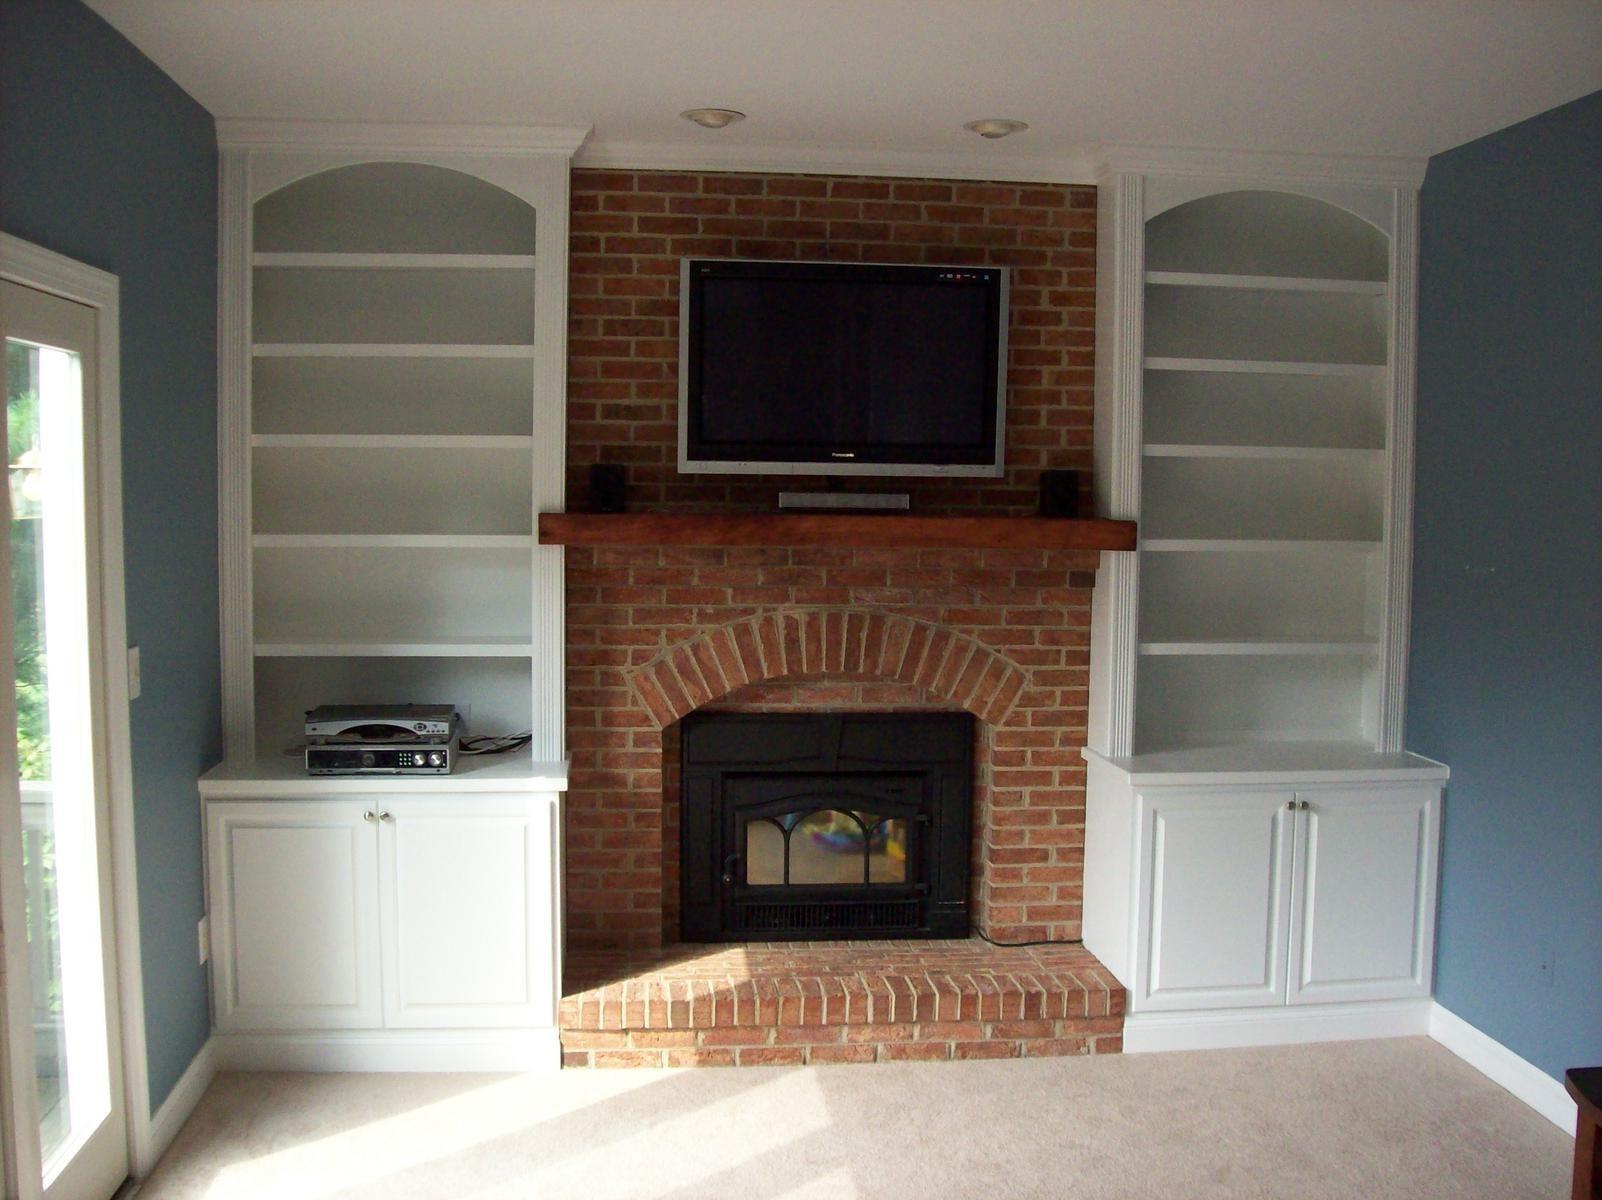 Transitional Interior Brick Wall Ideas and interior brick ...